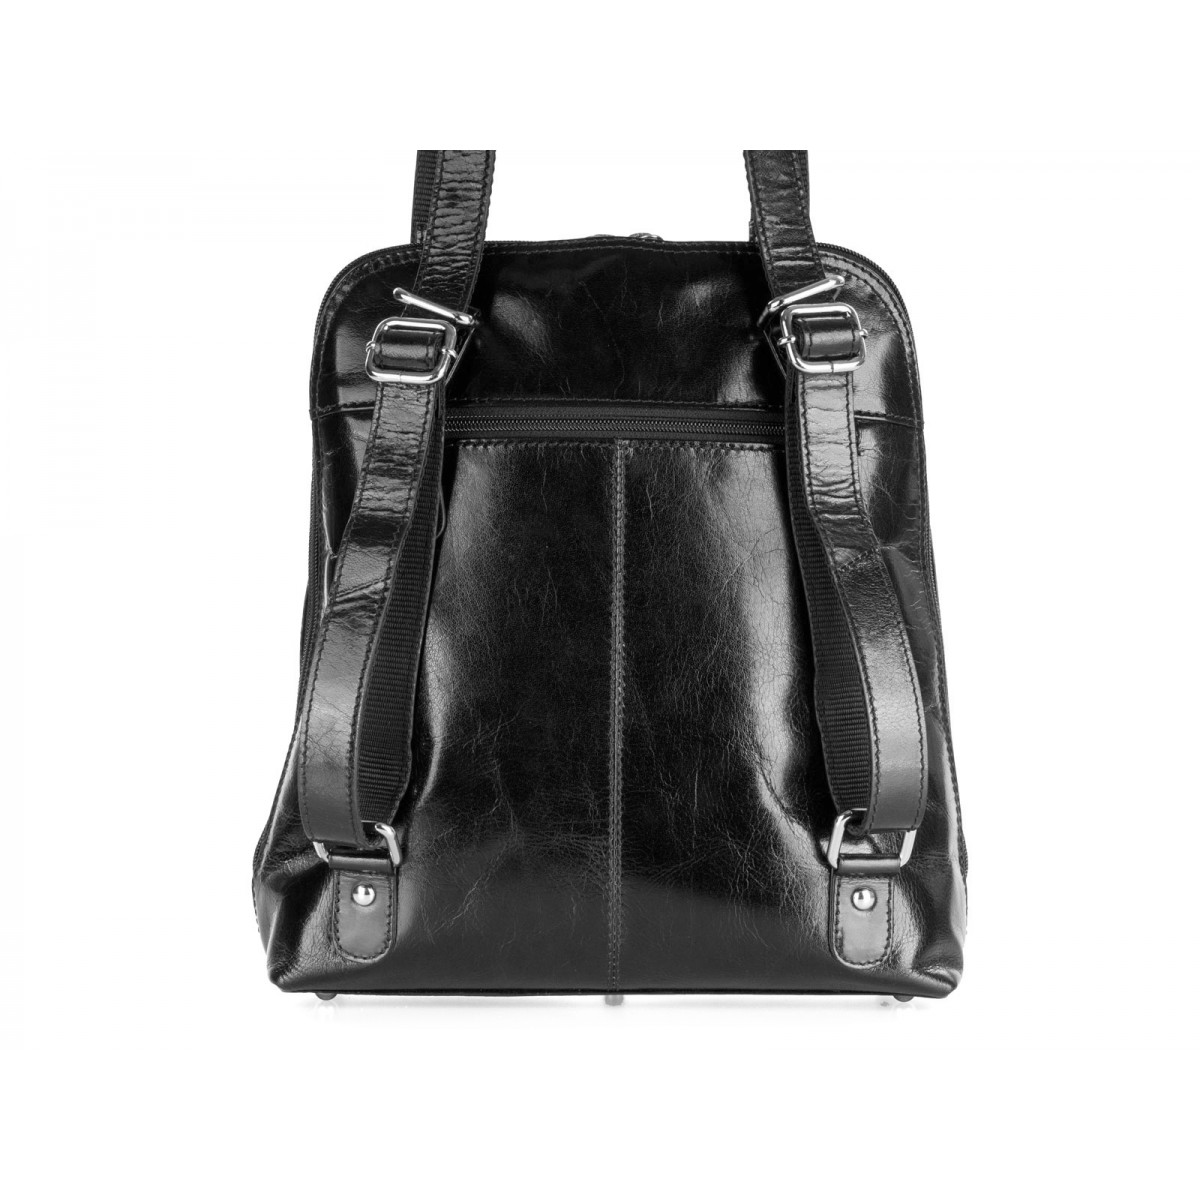 Combi rygsæk i sort-33